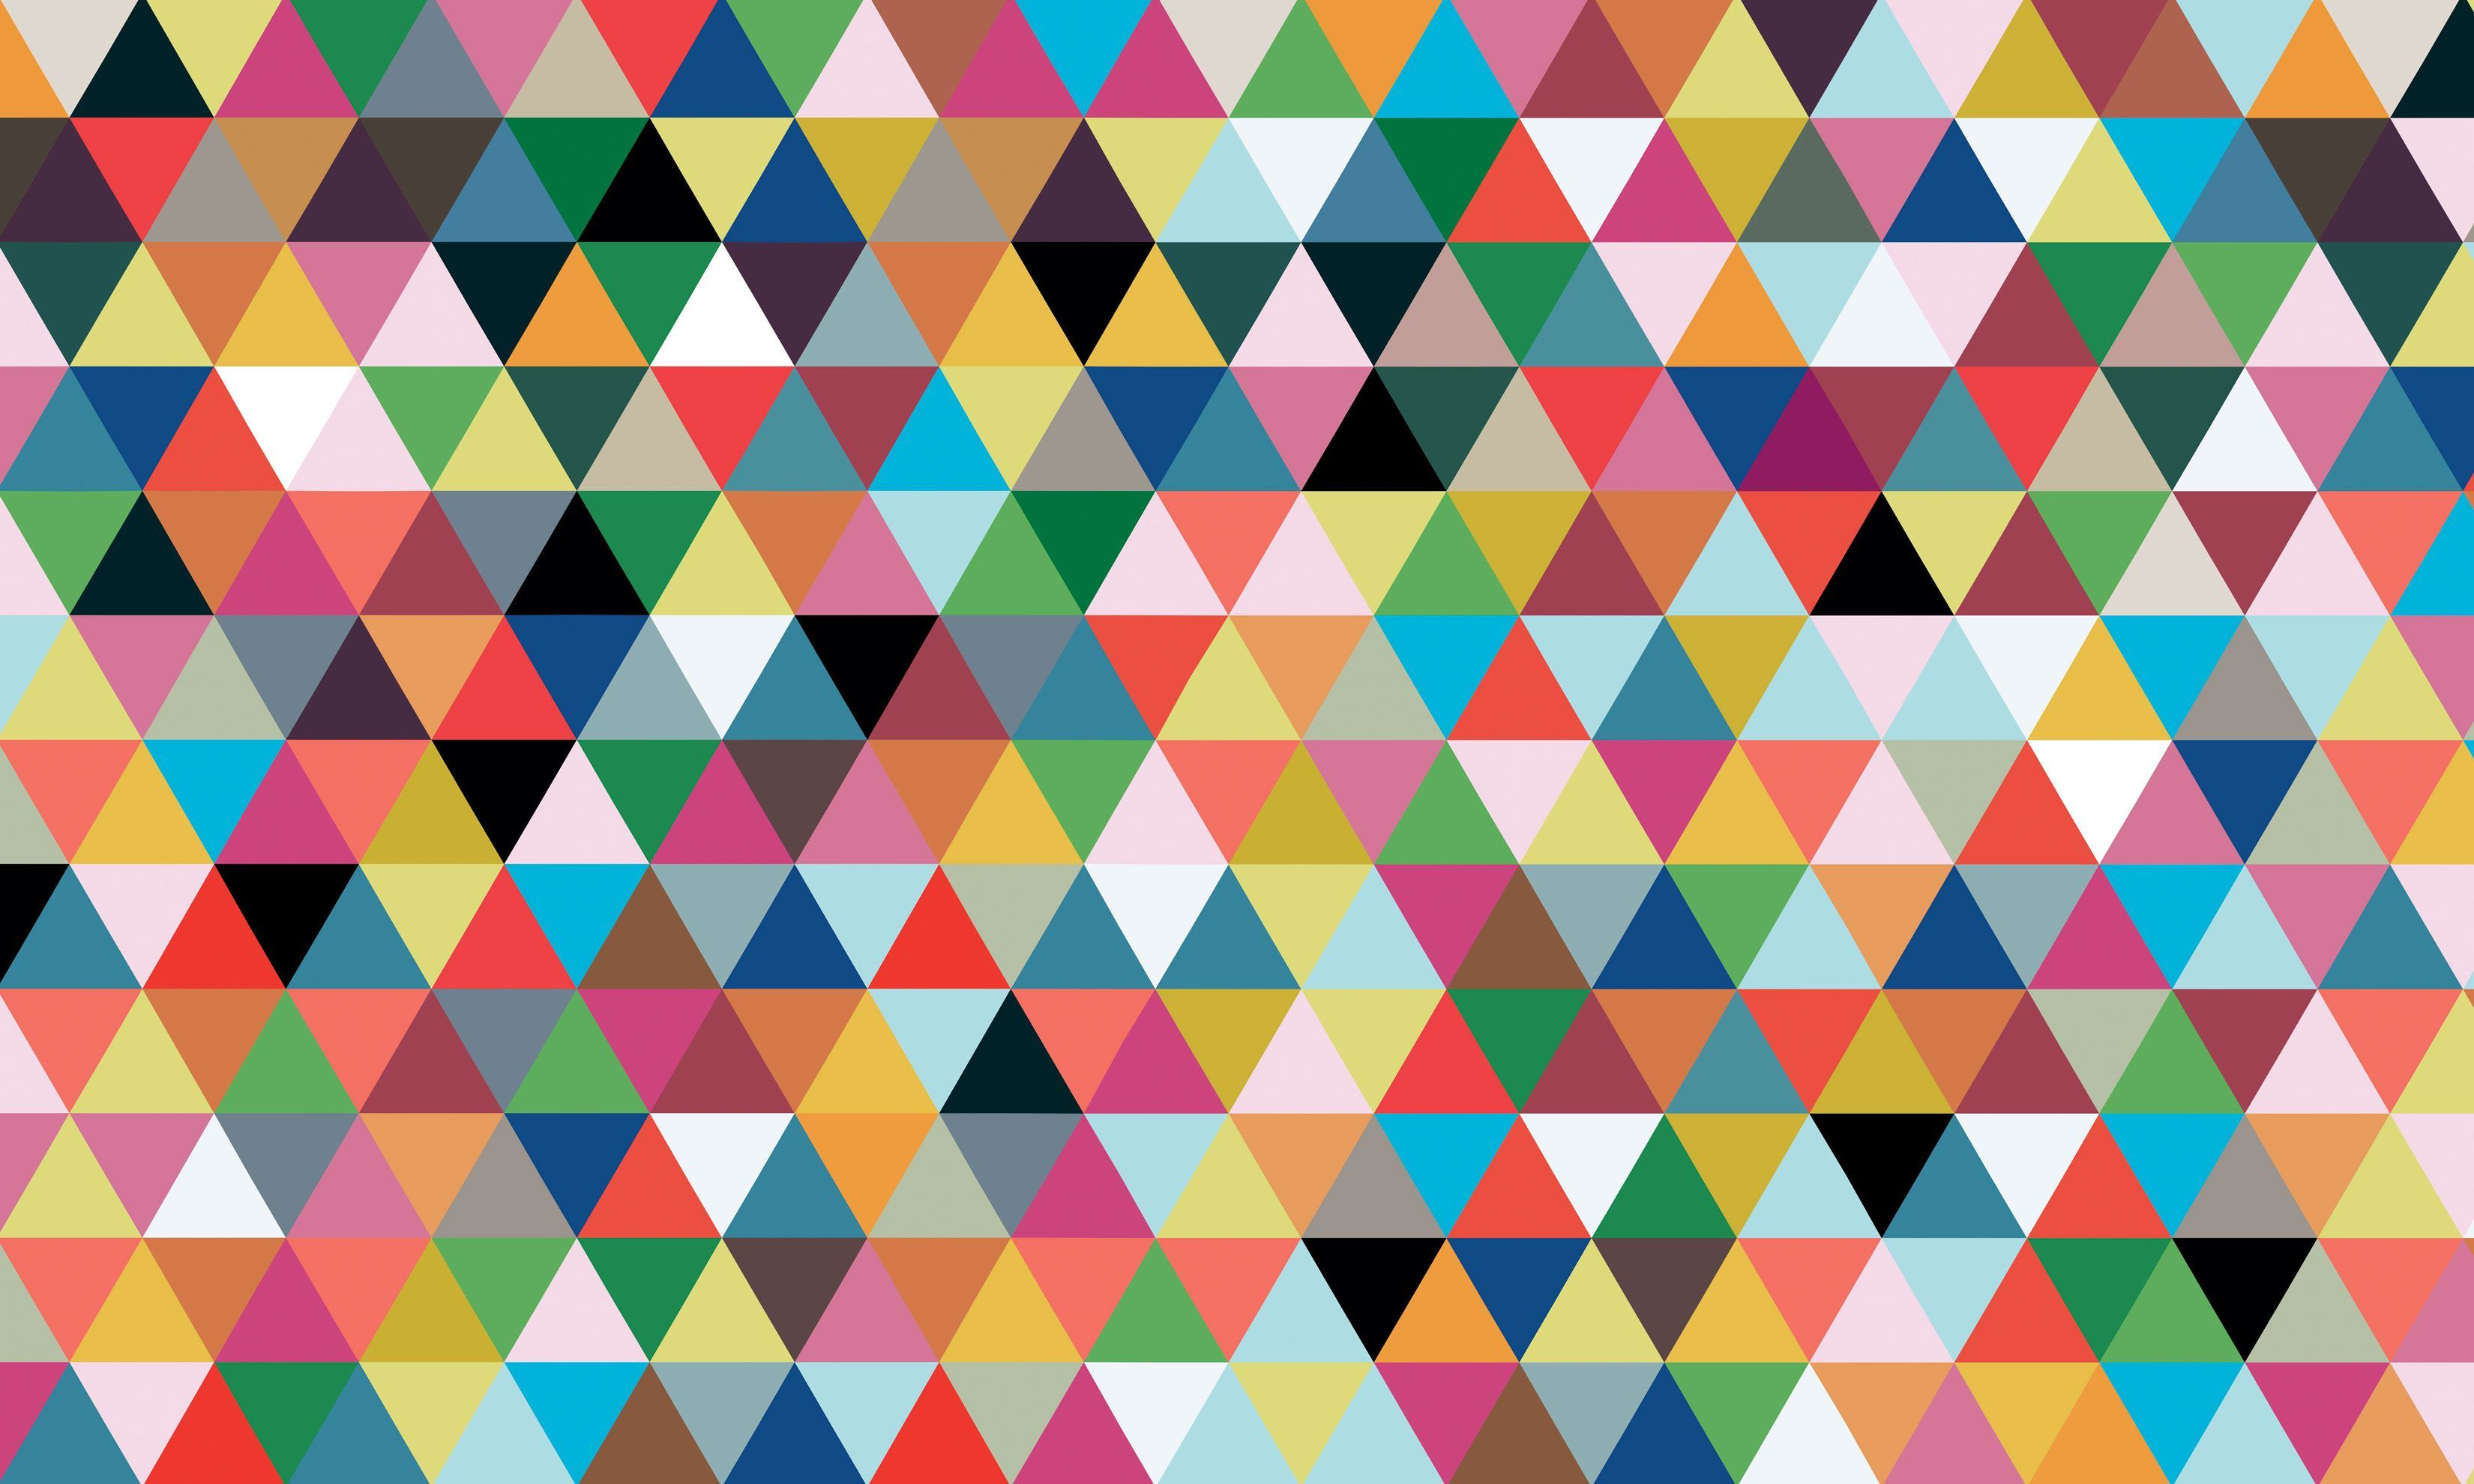 Geometric Triangle Wallpapers Top Free Geometric Triangle